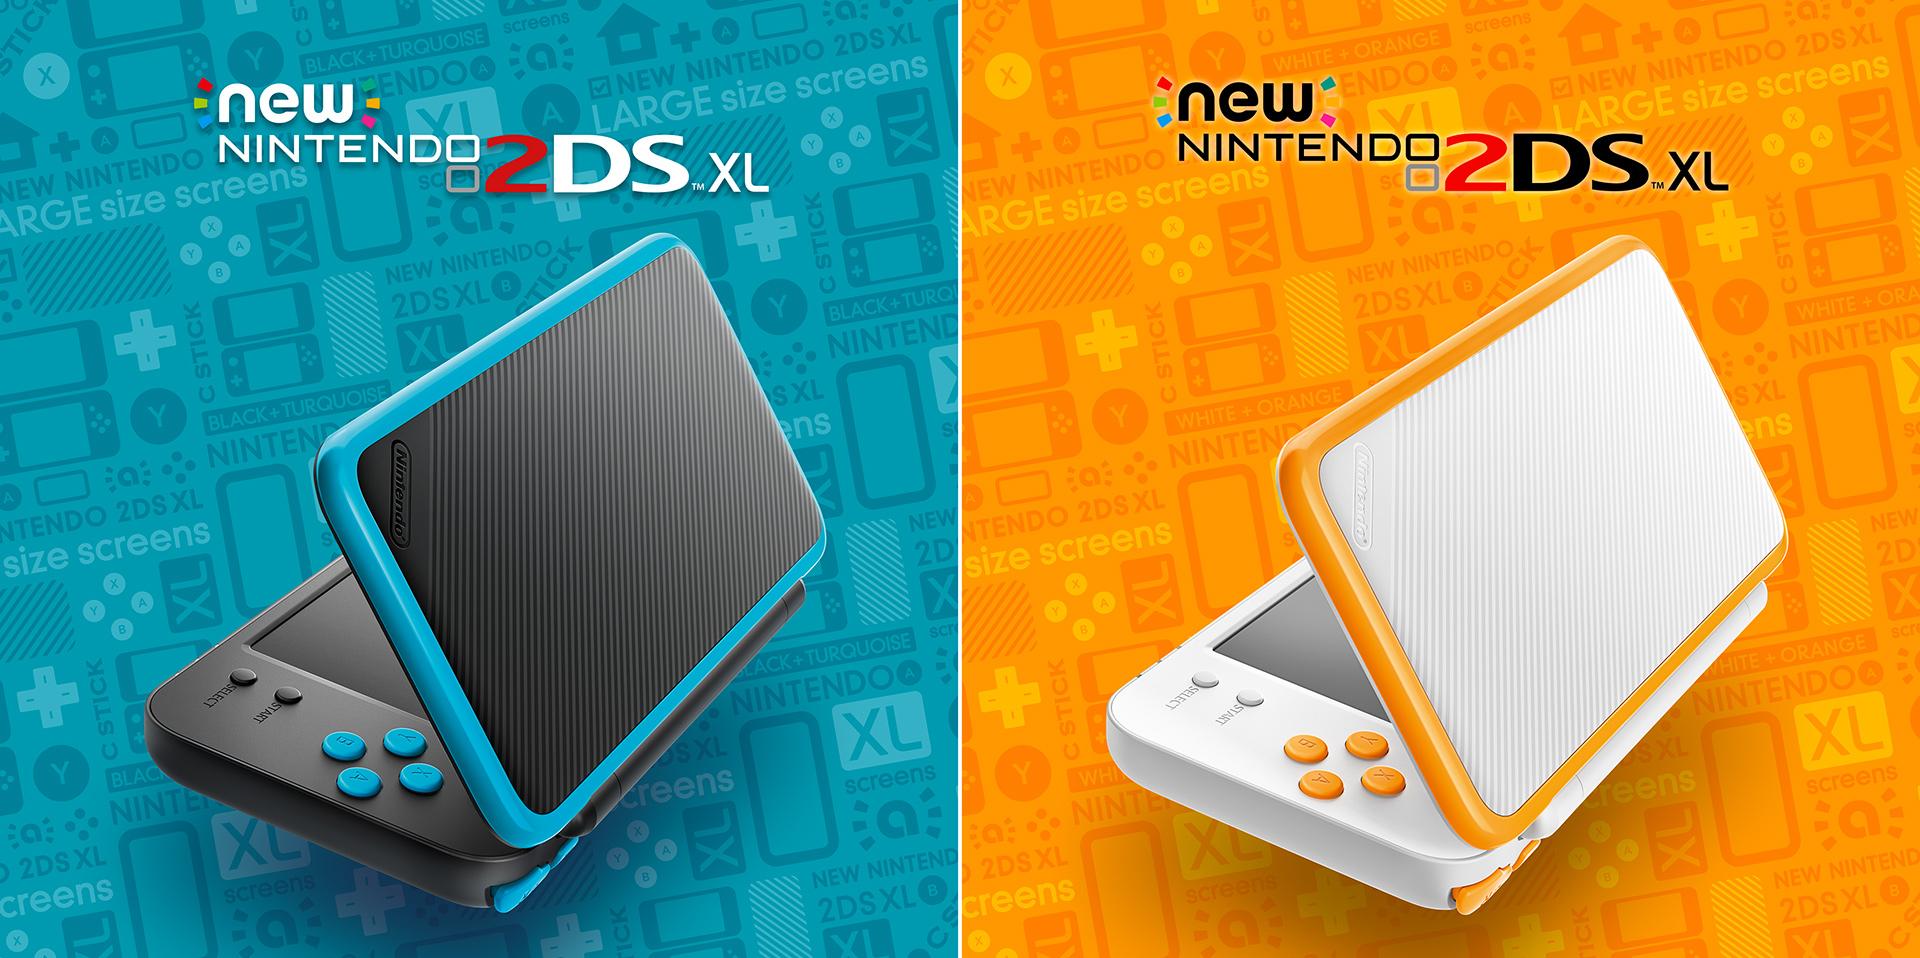 new-nintendo-2ds-xl-visual